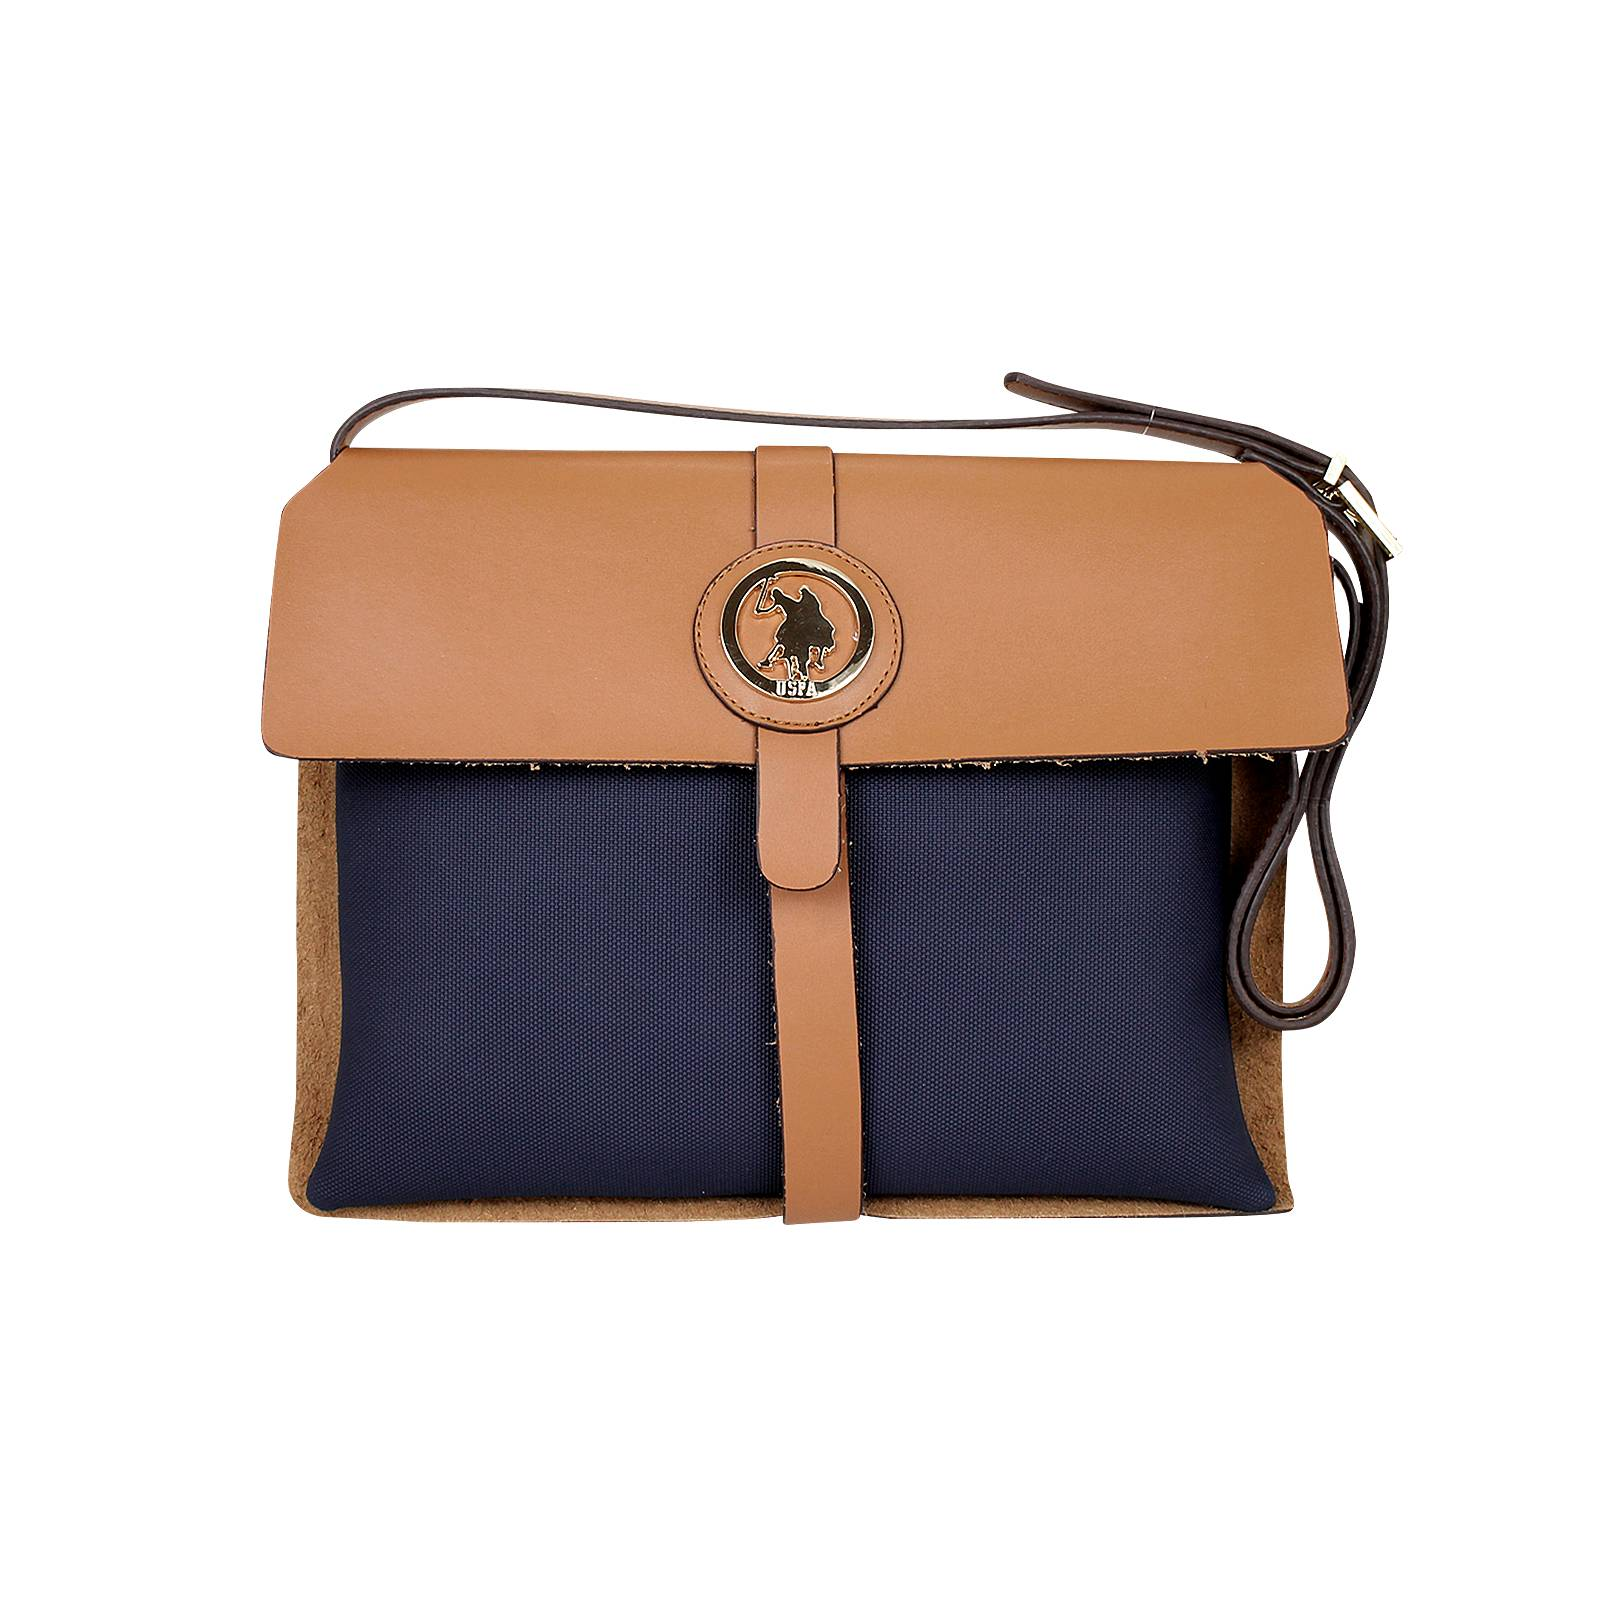 093c7a97a5 Tollerton - Γυναικεία τσάντα U.S. Polo ASSN από δερμα συνθετικο και ...